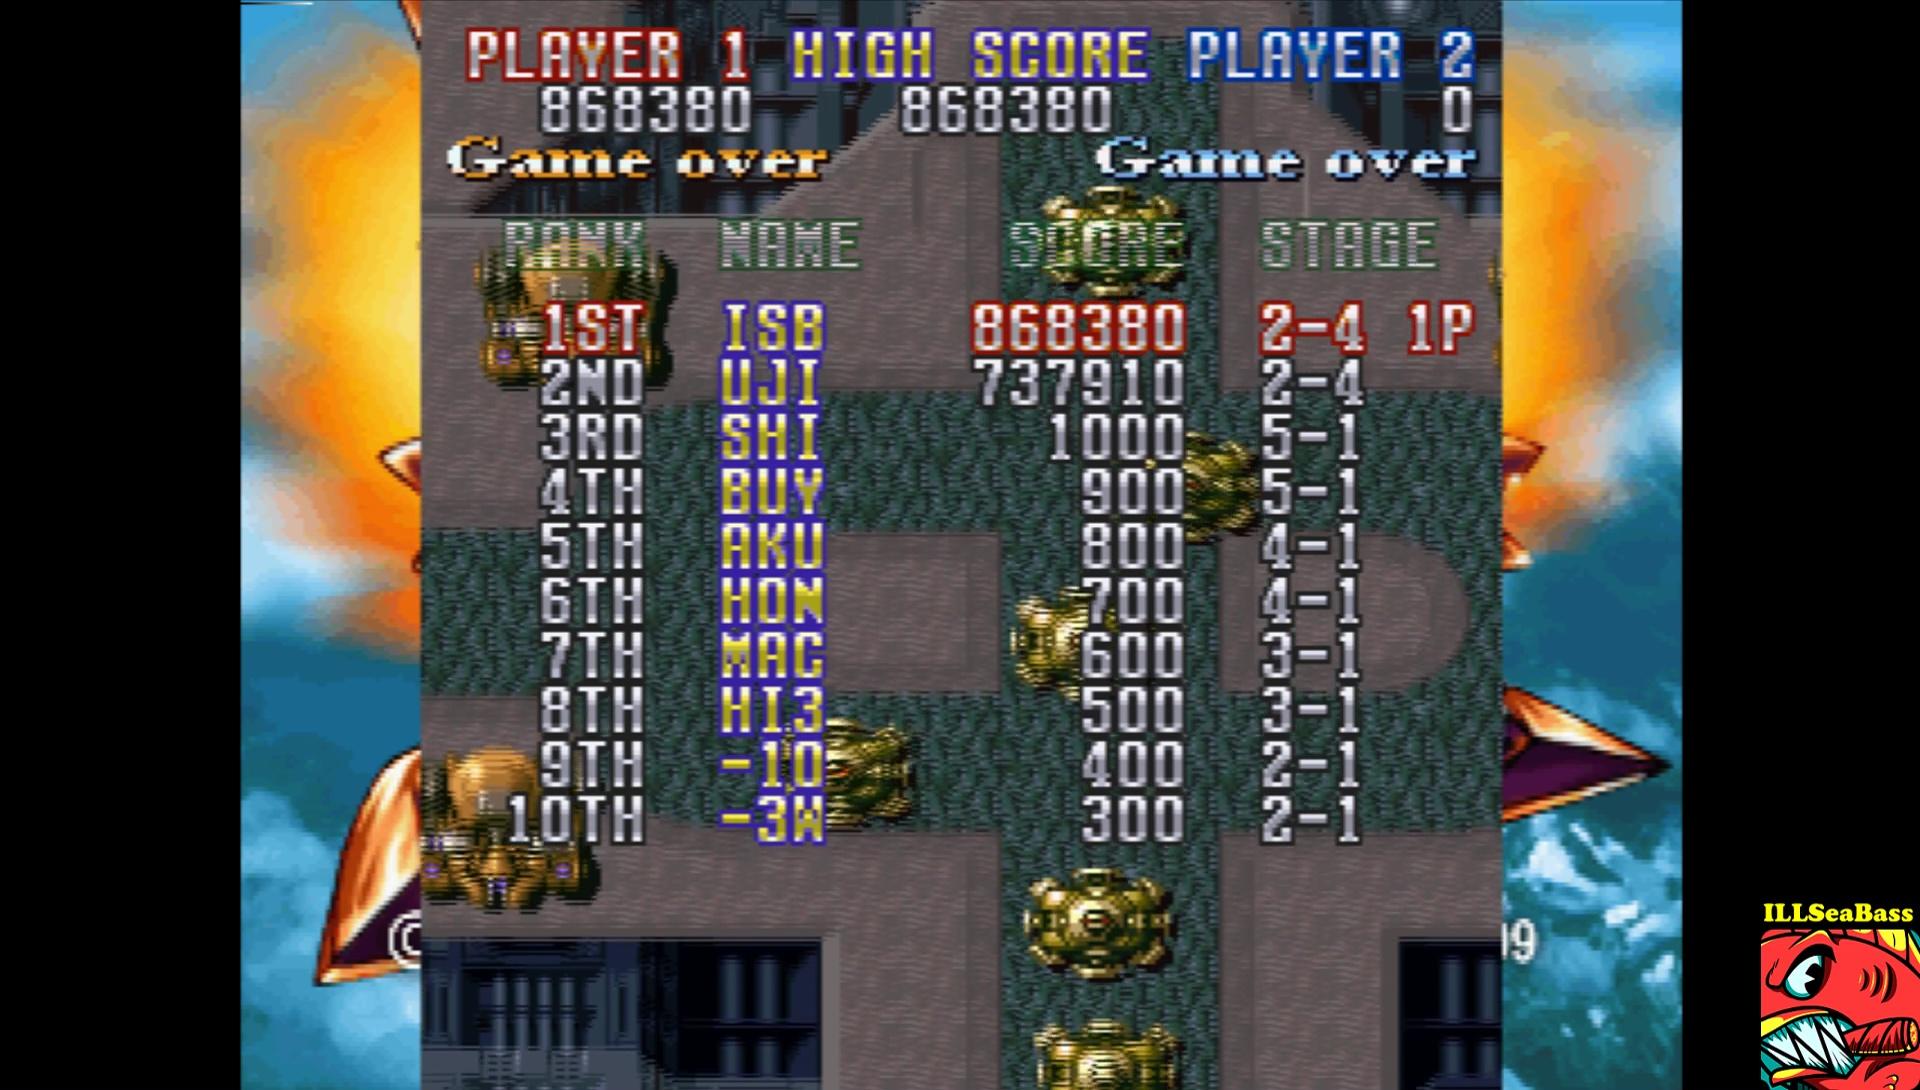 ILLSeaBass: Gekioh: Shooting King [Hard Mode] (Playstation 1 Emulated) 868,380 points on 2017-02-12 22:12:57